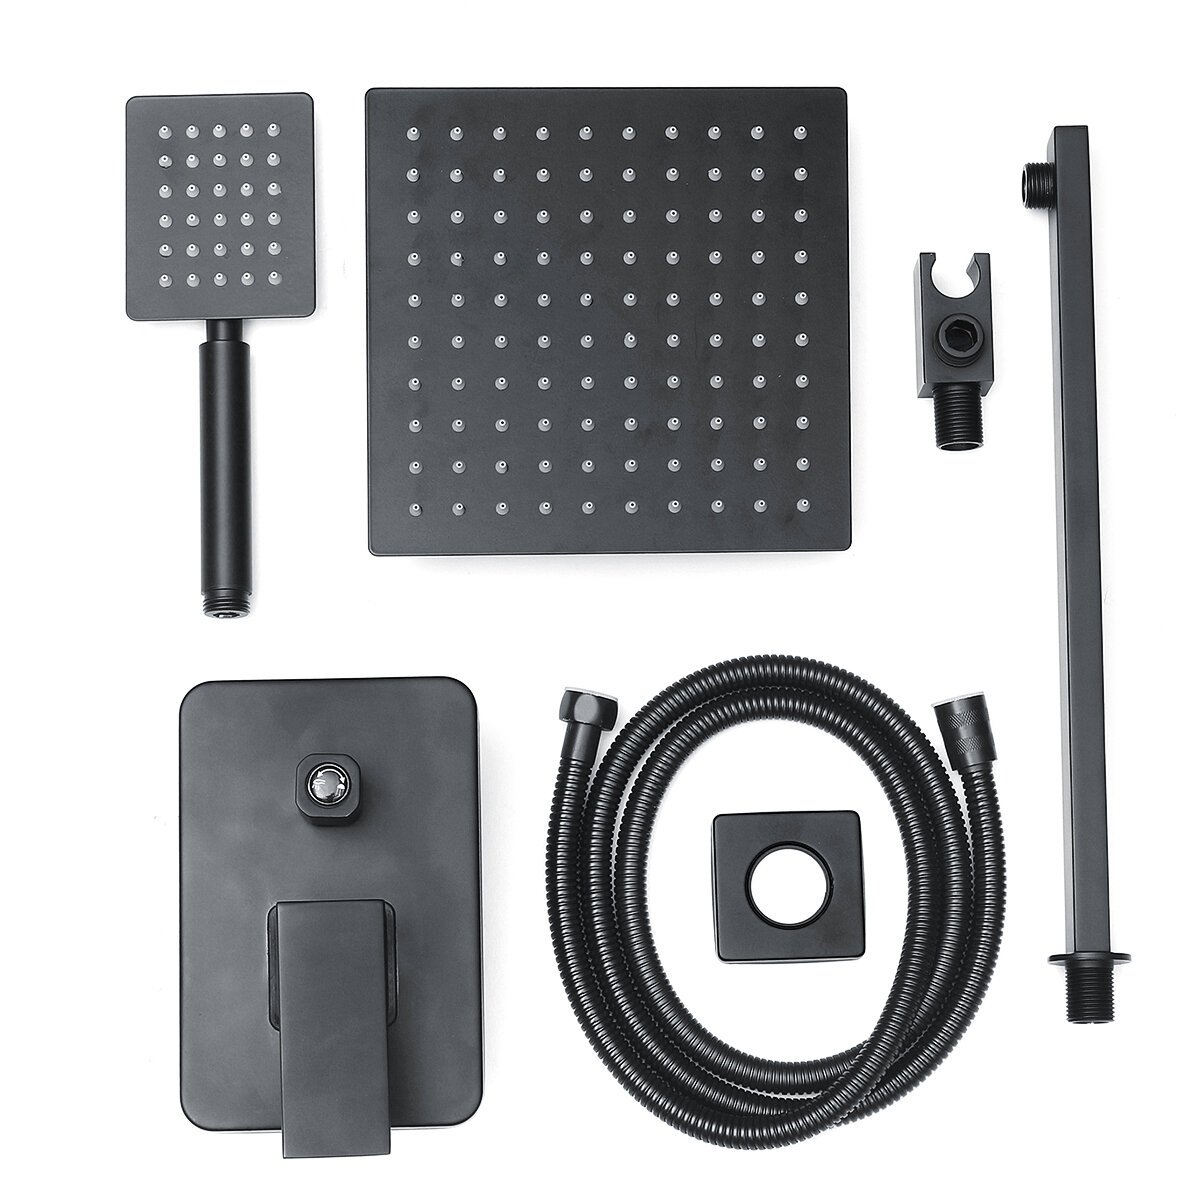 8 Black Wall Mounted Rainfall Shower Head Faucet Tub Spout Mixer Tap Shower Combo Set